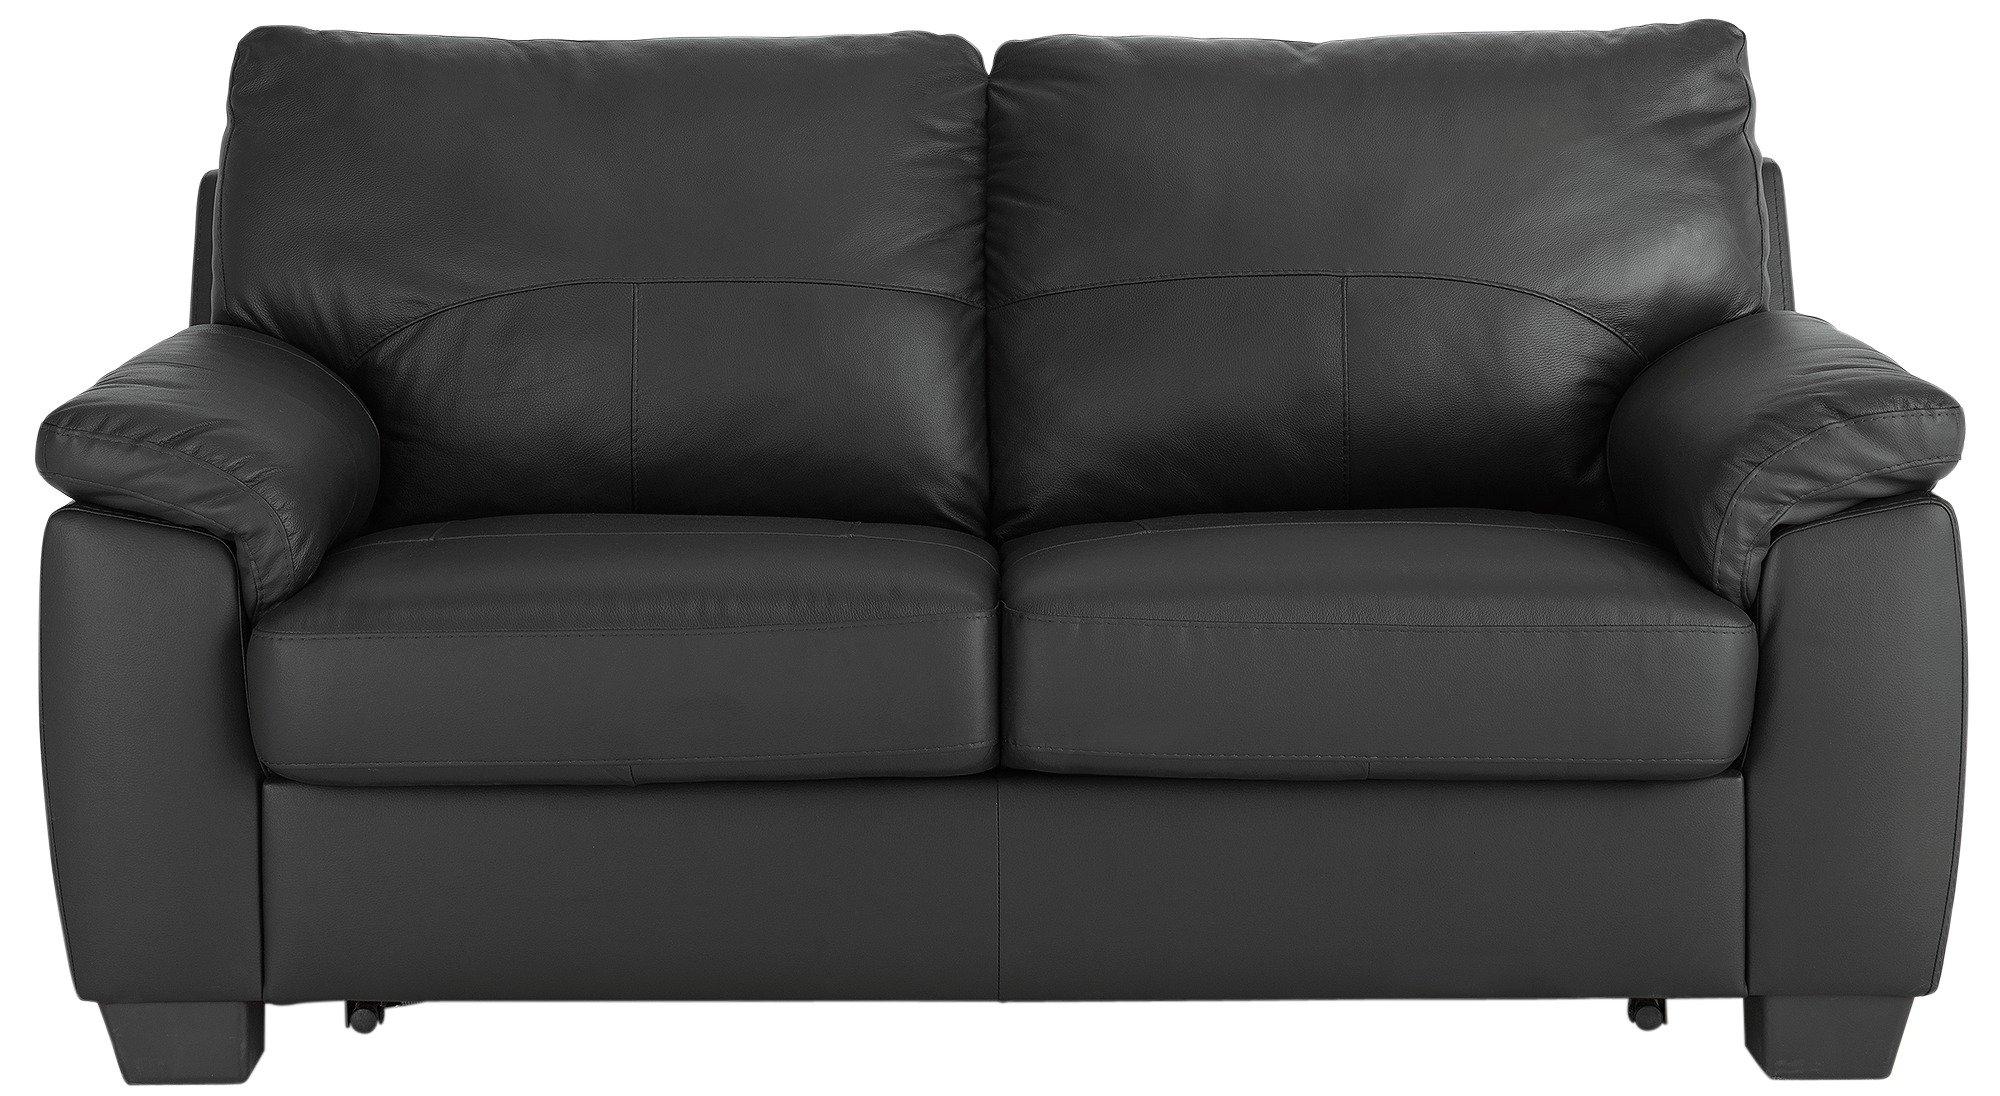 Argos Home Logan 2 Seater Faux Leather Sofa Bed Black 3957600 Argos Price Tracker Pricehistory Co Uk